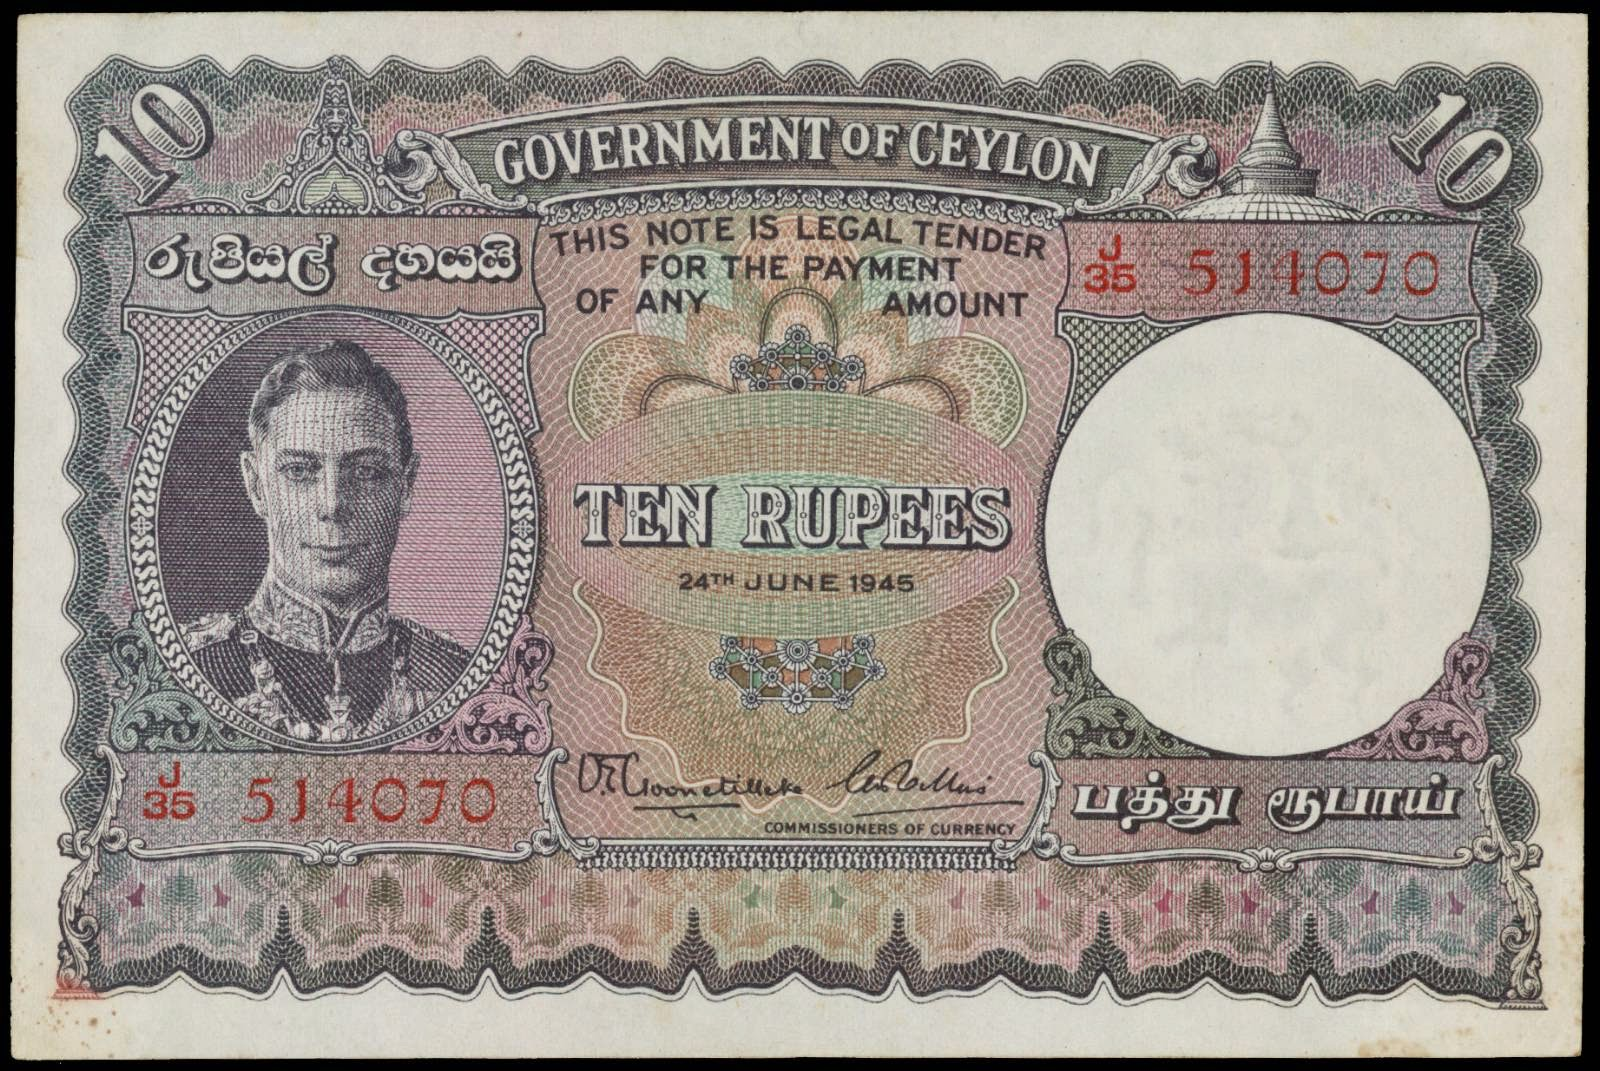 Ceylon banknotes 10 Rupees banknote 1945 King George VI